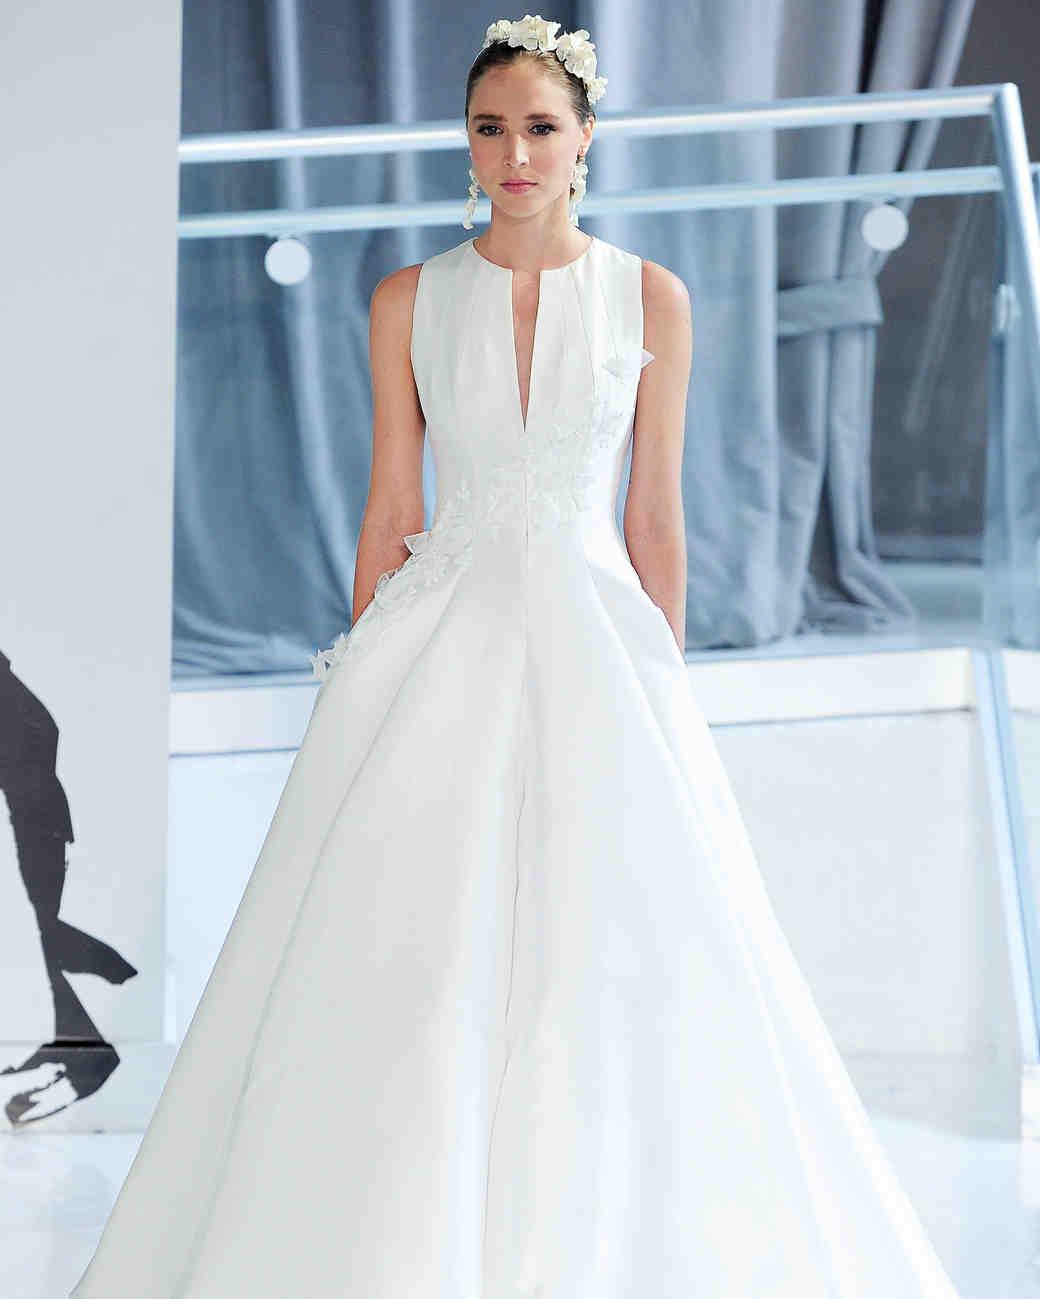 Modern Kate Moss Style Wedding Dress Ideas - All Wedding Dresses ...